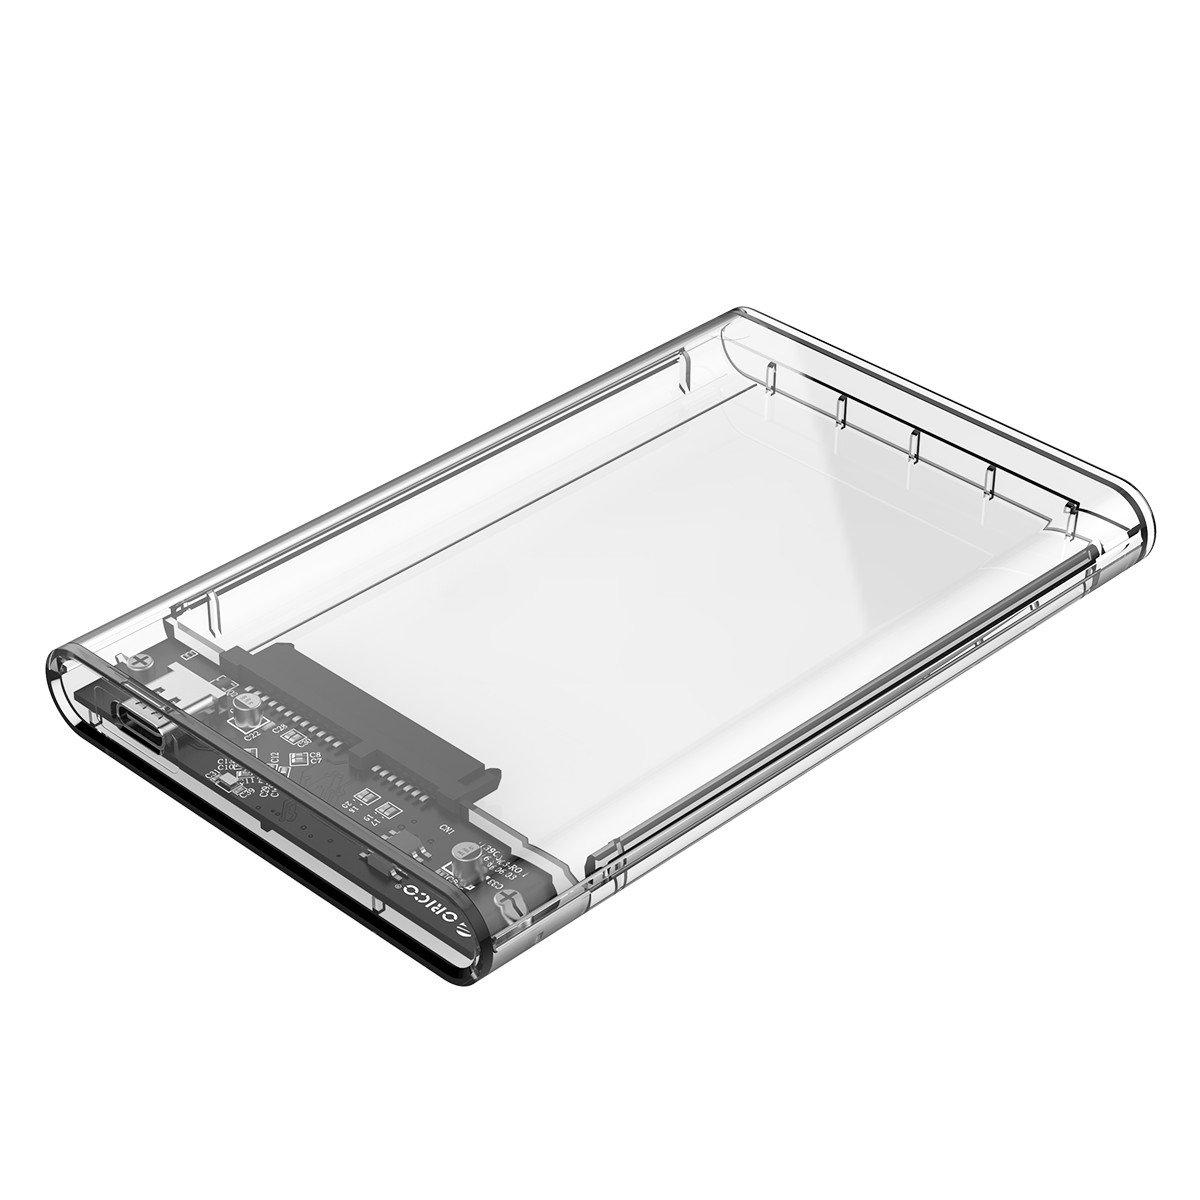 [Gearbest] ORICO 2139U3 2.5 Festplattengehäuse